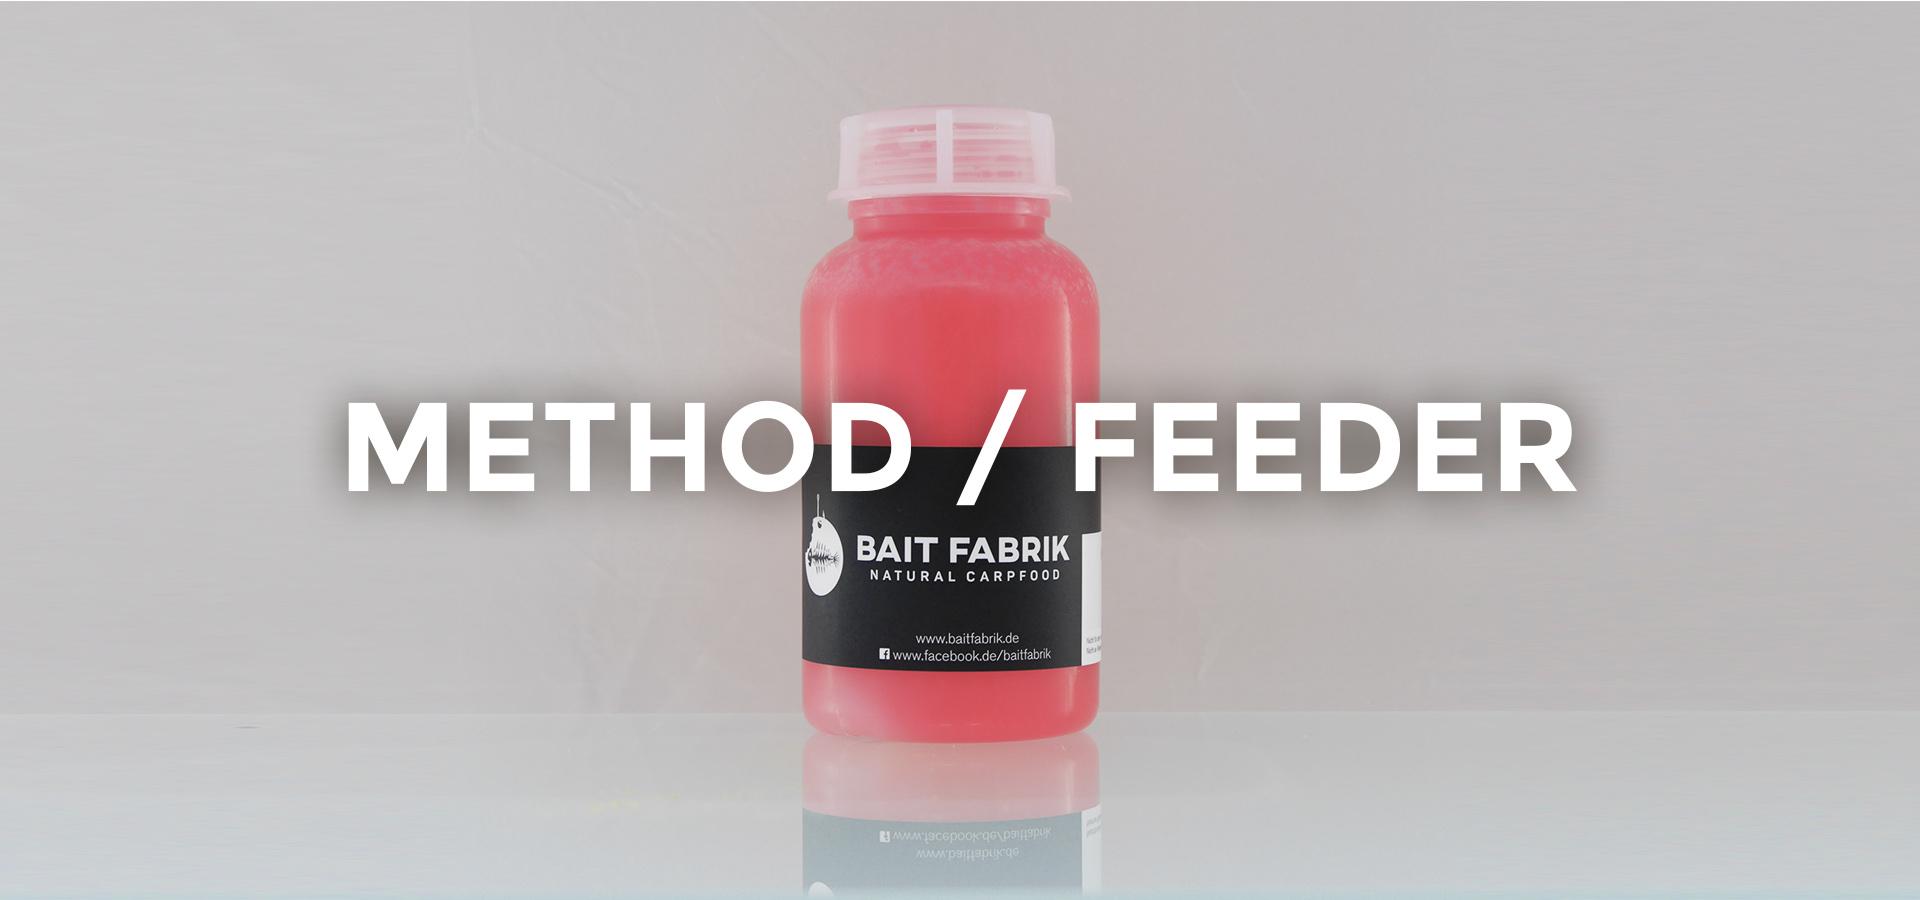 Feeder/Method Köder